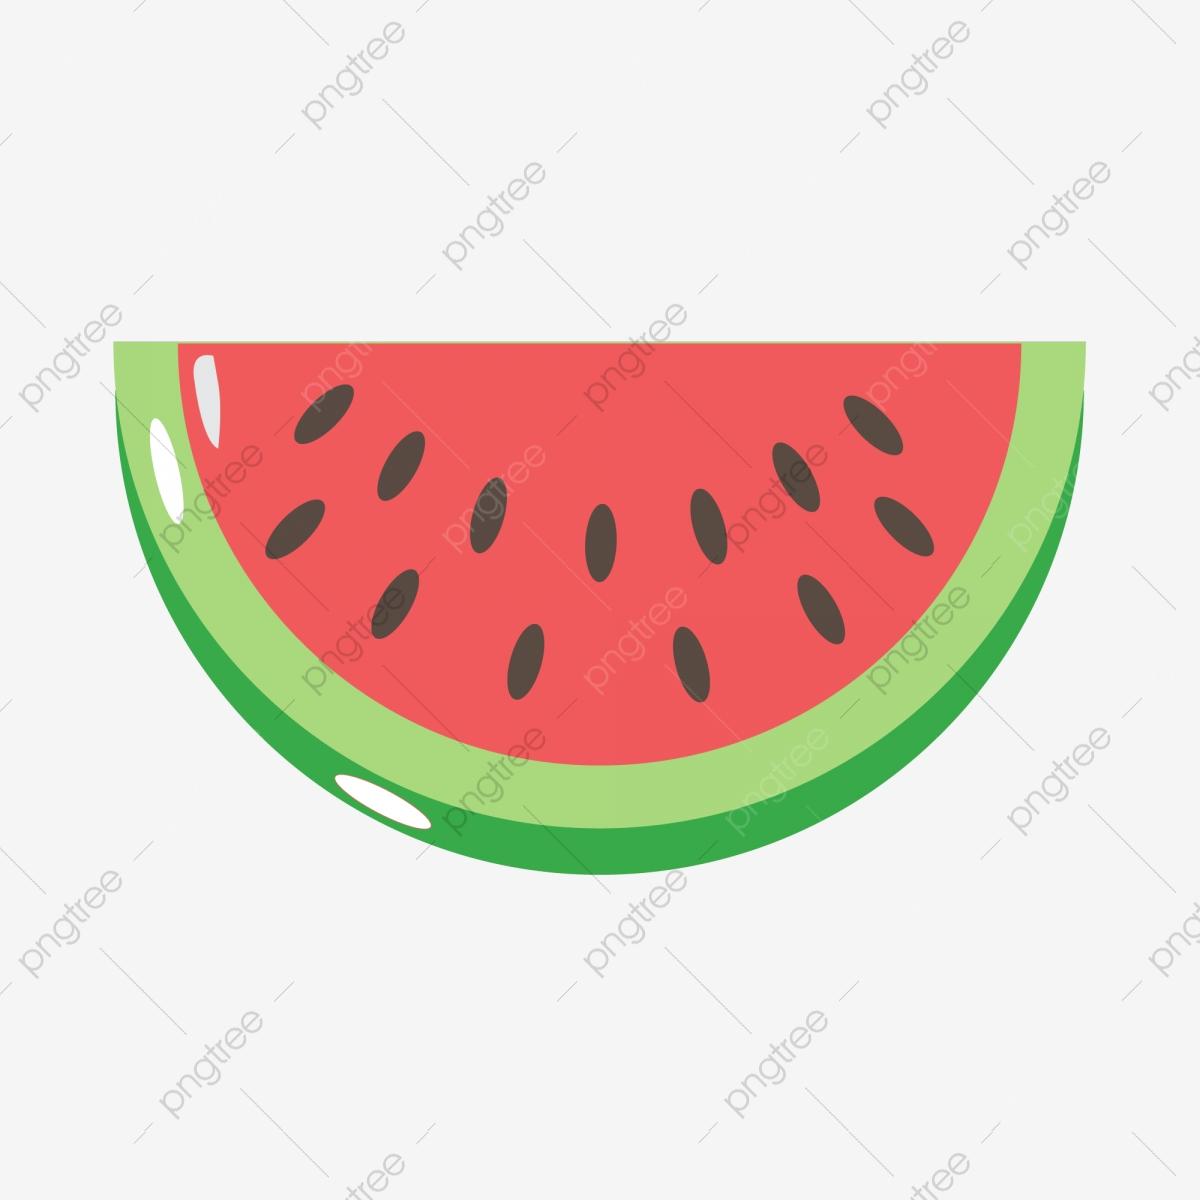 Watermelon clipart half watermelon. Hand painted a summer